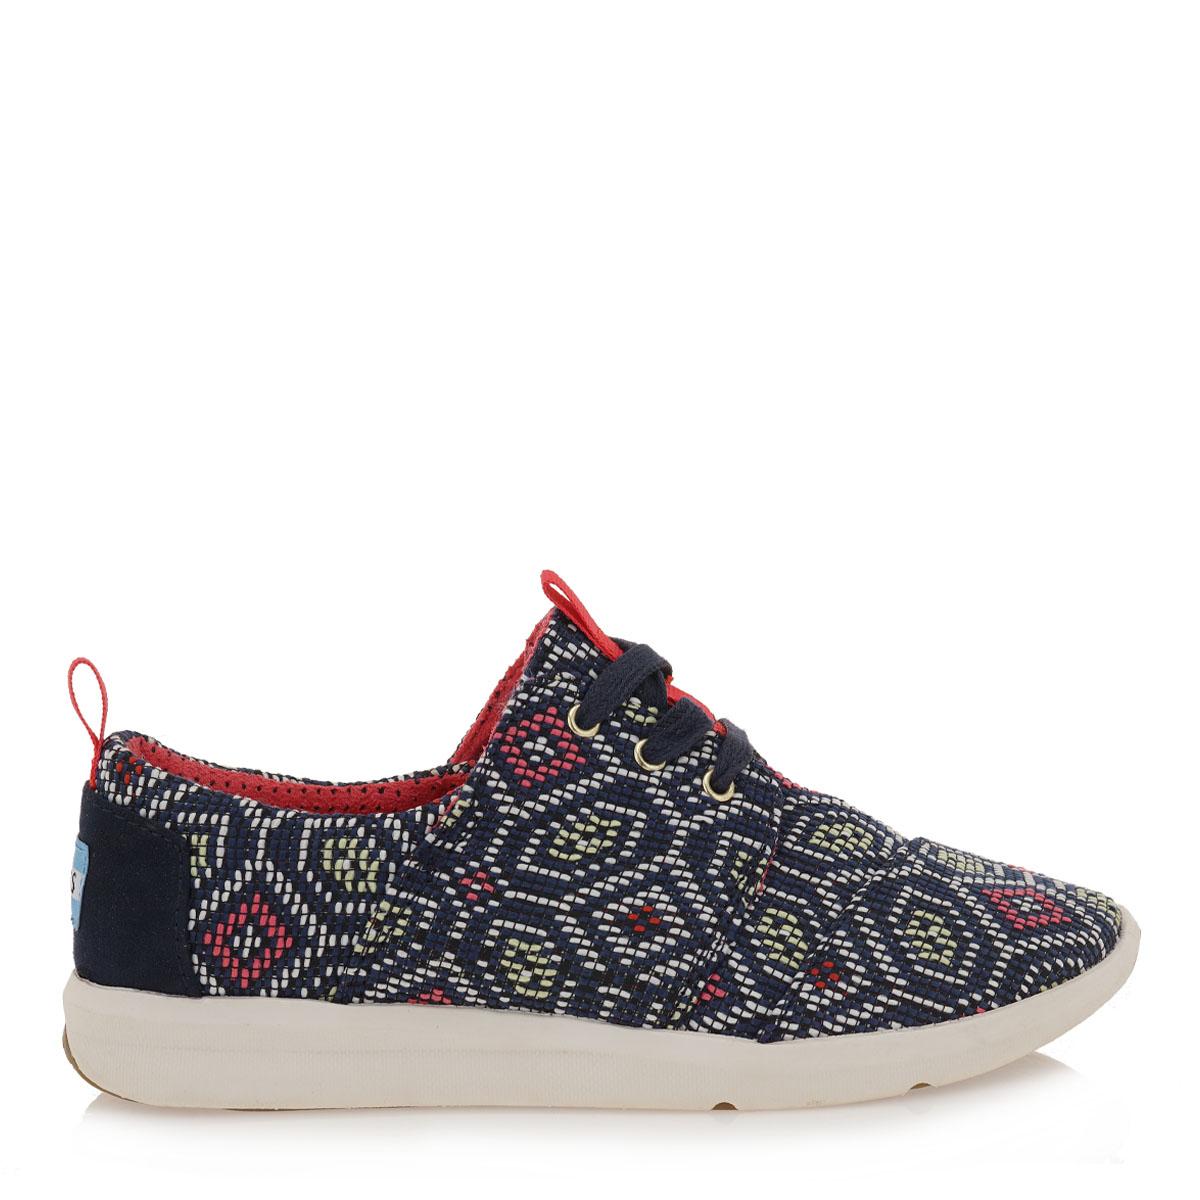 SNEAKERS σχέδιο: I108L0991 outlet   γυναικεια   sneakers